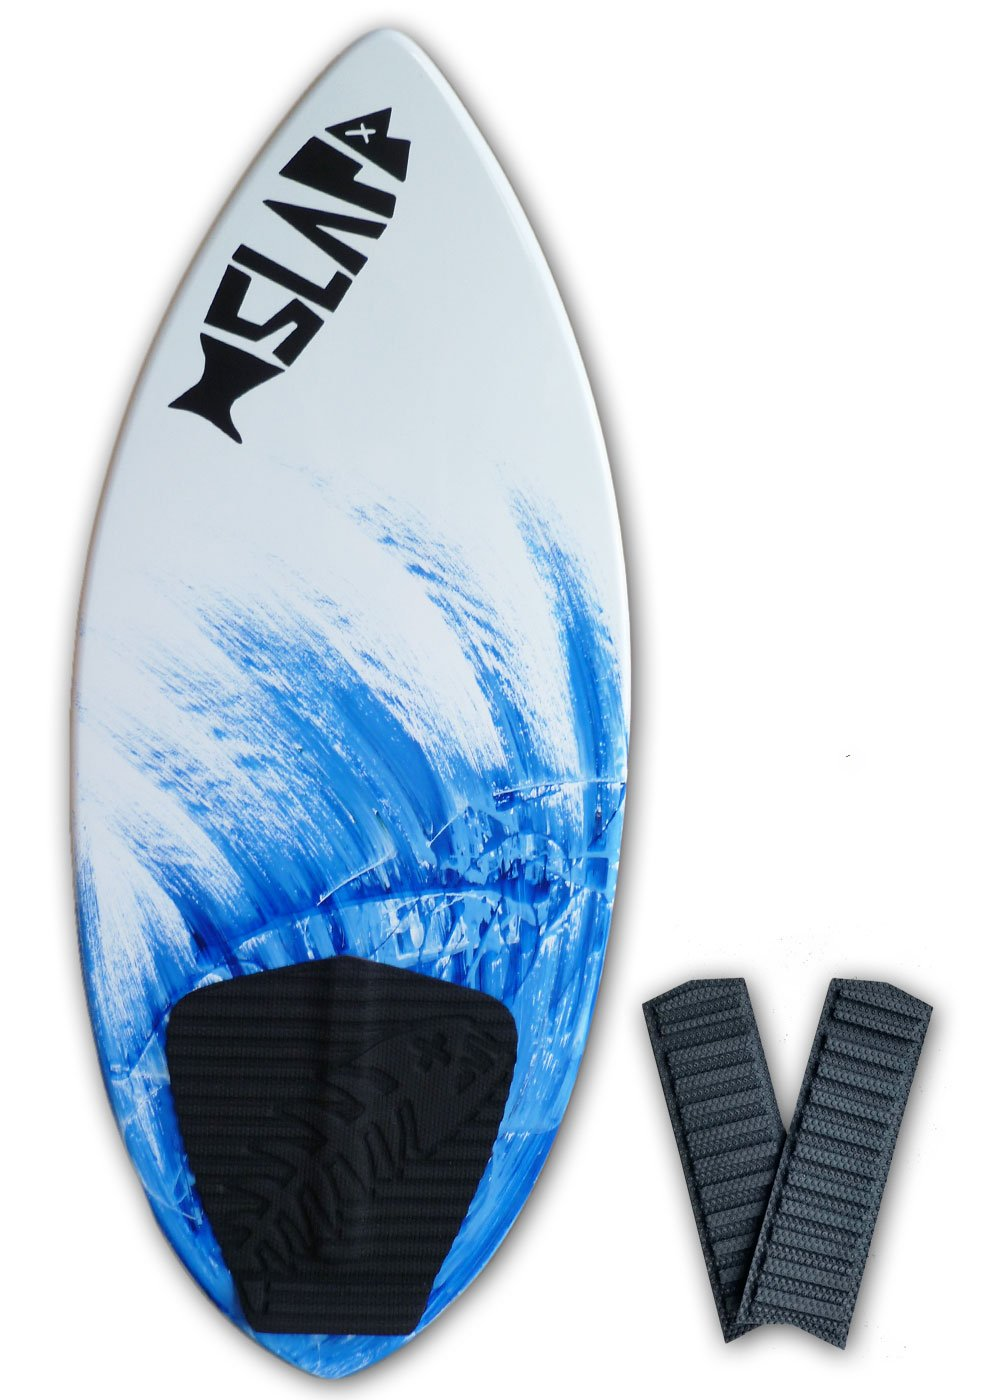 Slapfish Skimboards - Fiberglass & Carbon with Traction Deck Grip - Kids & Adults - 2 Sizes - Blue (41'' Board & Arch Bar)